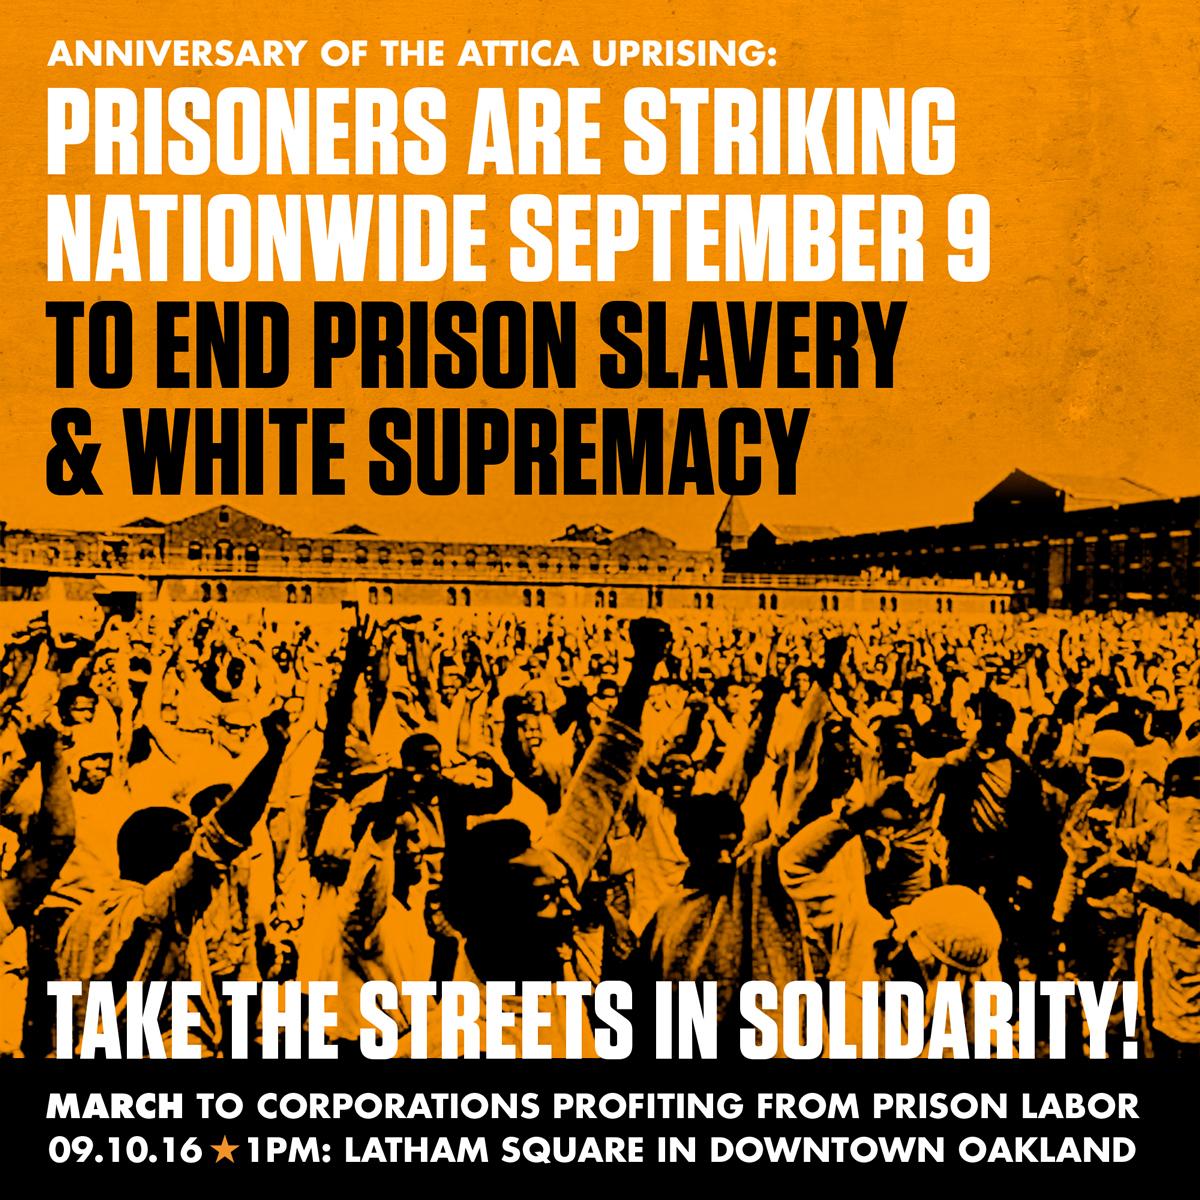 PrisonStrike_OaklandMarch_Attica